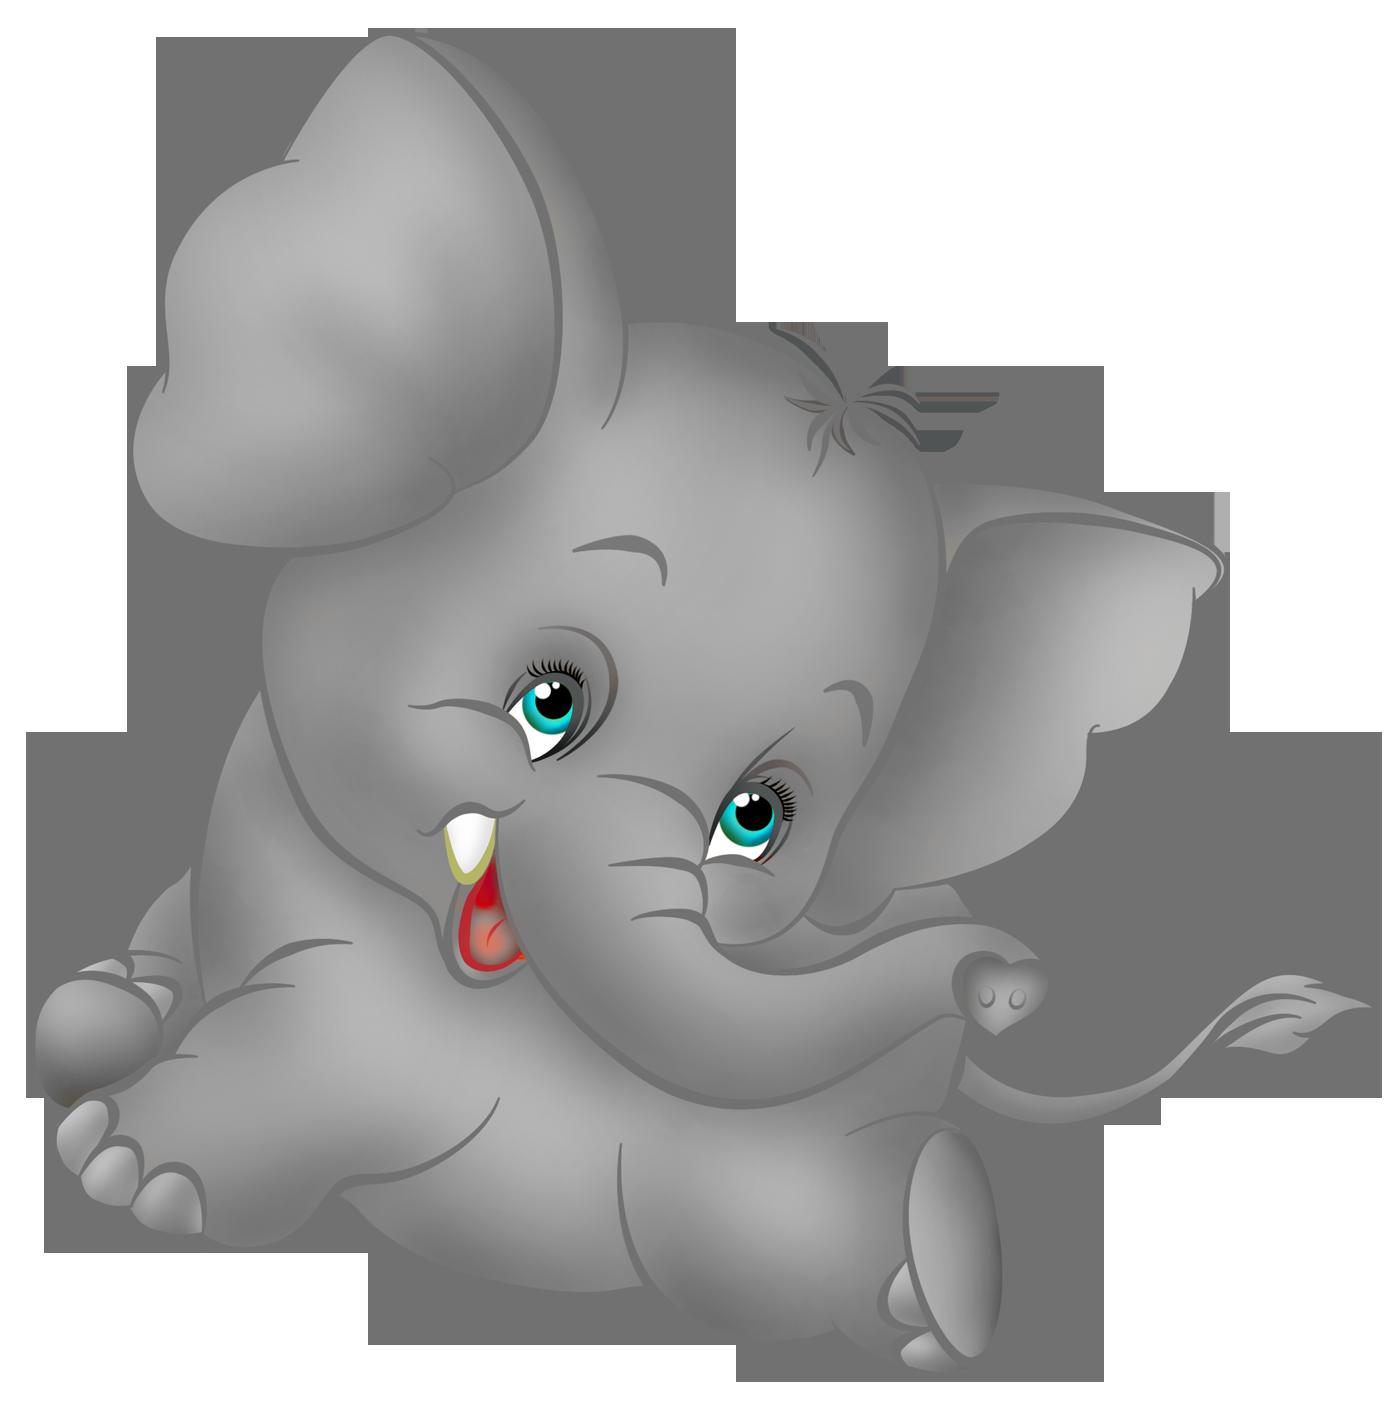 Baby Elephant's Cute - Elephant Cartoon Clip Art | drawing ...